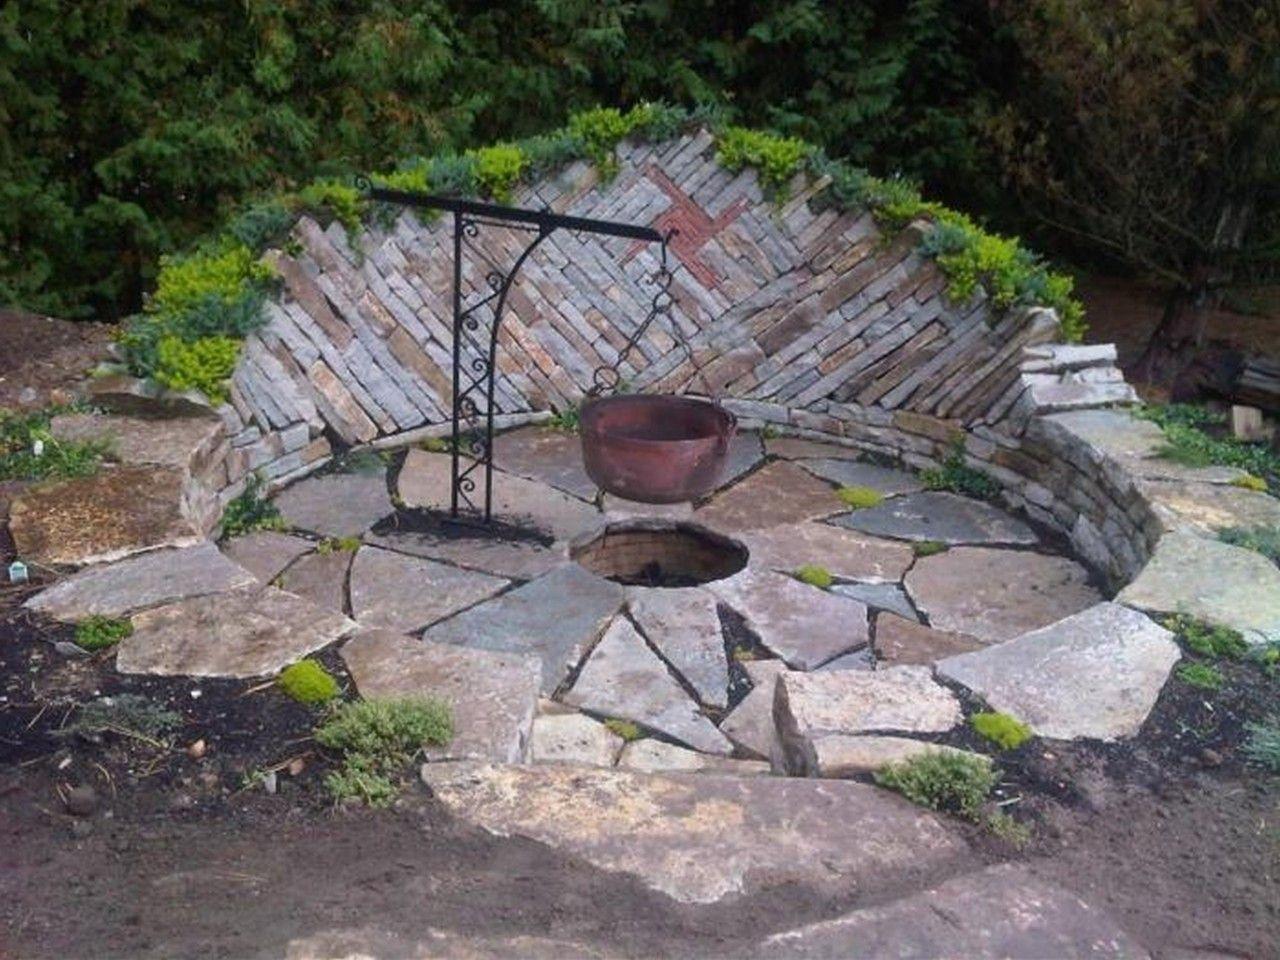 Swish Exterior Backyard Fire Pits Diy Backyard Ideas Landscaping Ideasfor Sloped Backyard Eclectic Style Backyard Fire Pit Idea Outdoorfire Backyard Canopy Ideas Layout Backyard Patio outdoor Cute Backyard Ideas